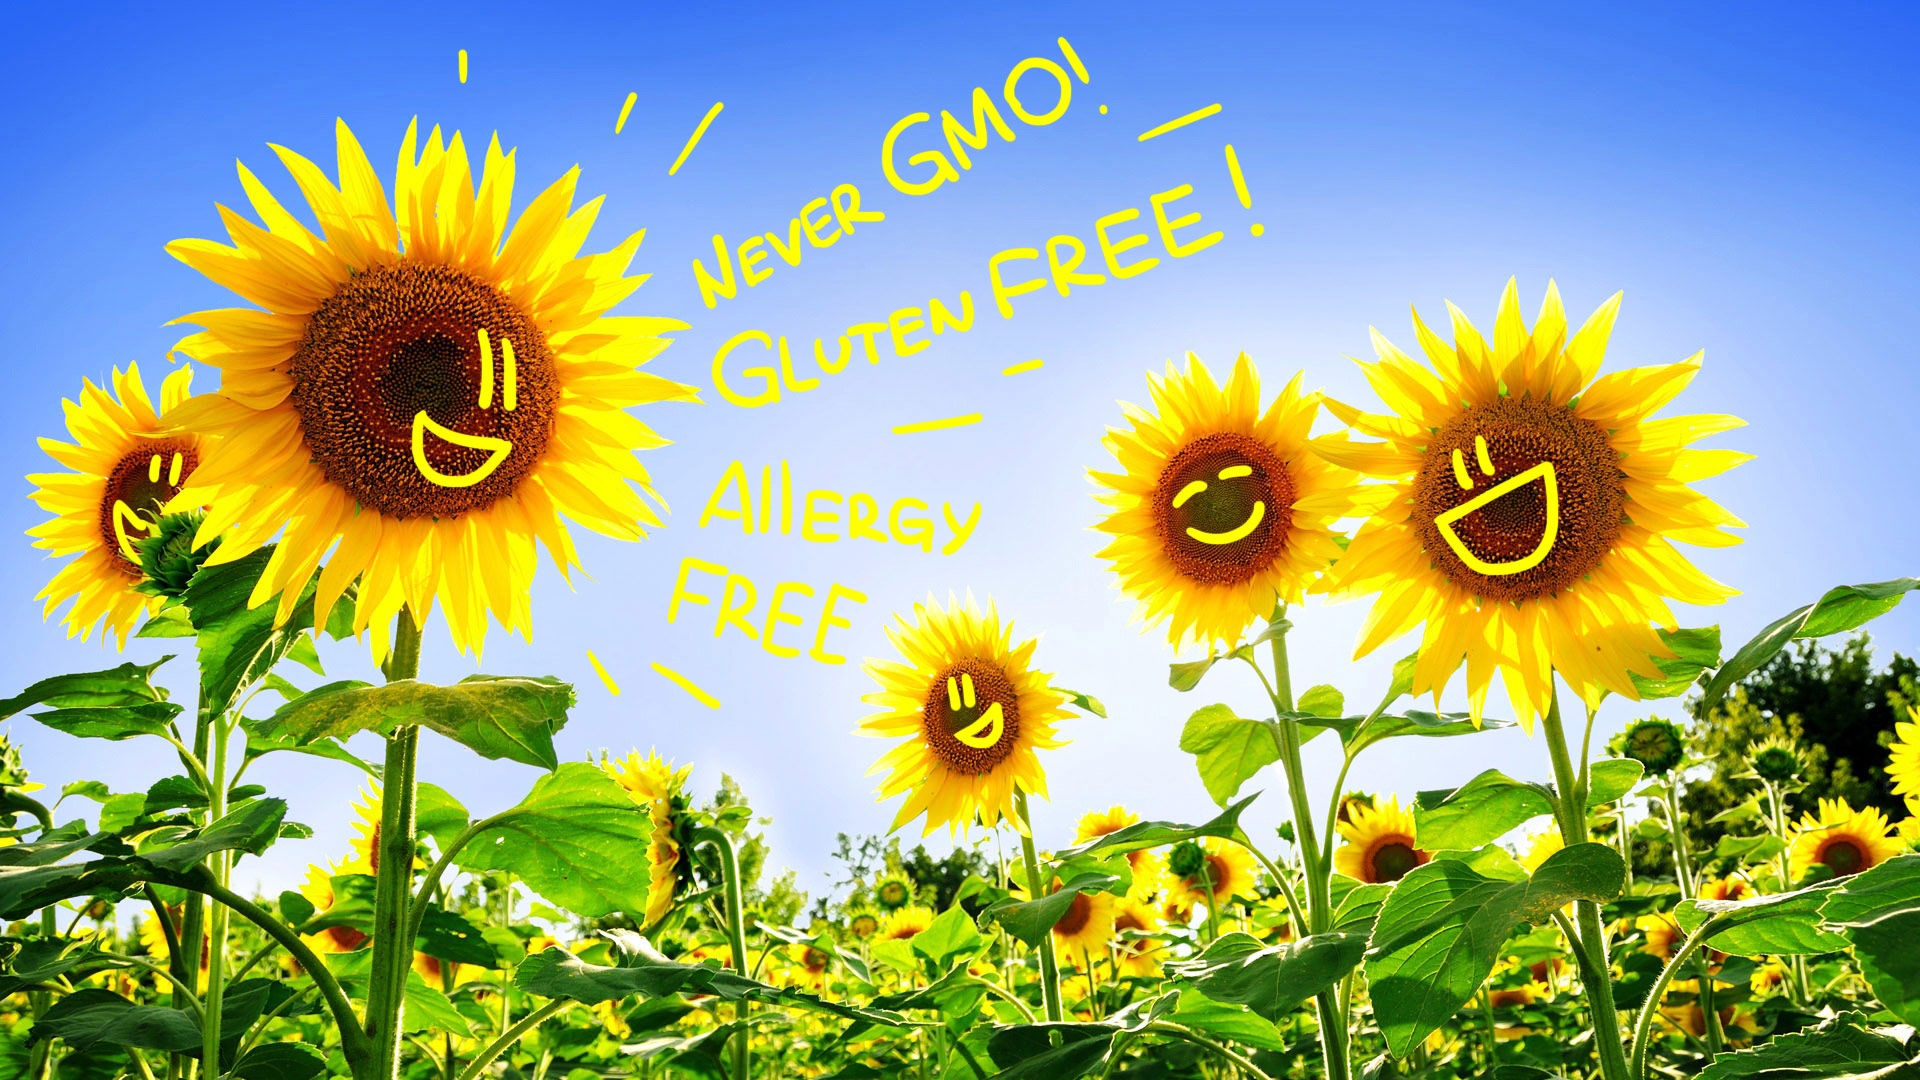 Sunflower Never GMO Gluten FREE Allergy FREE